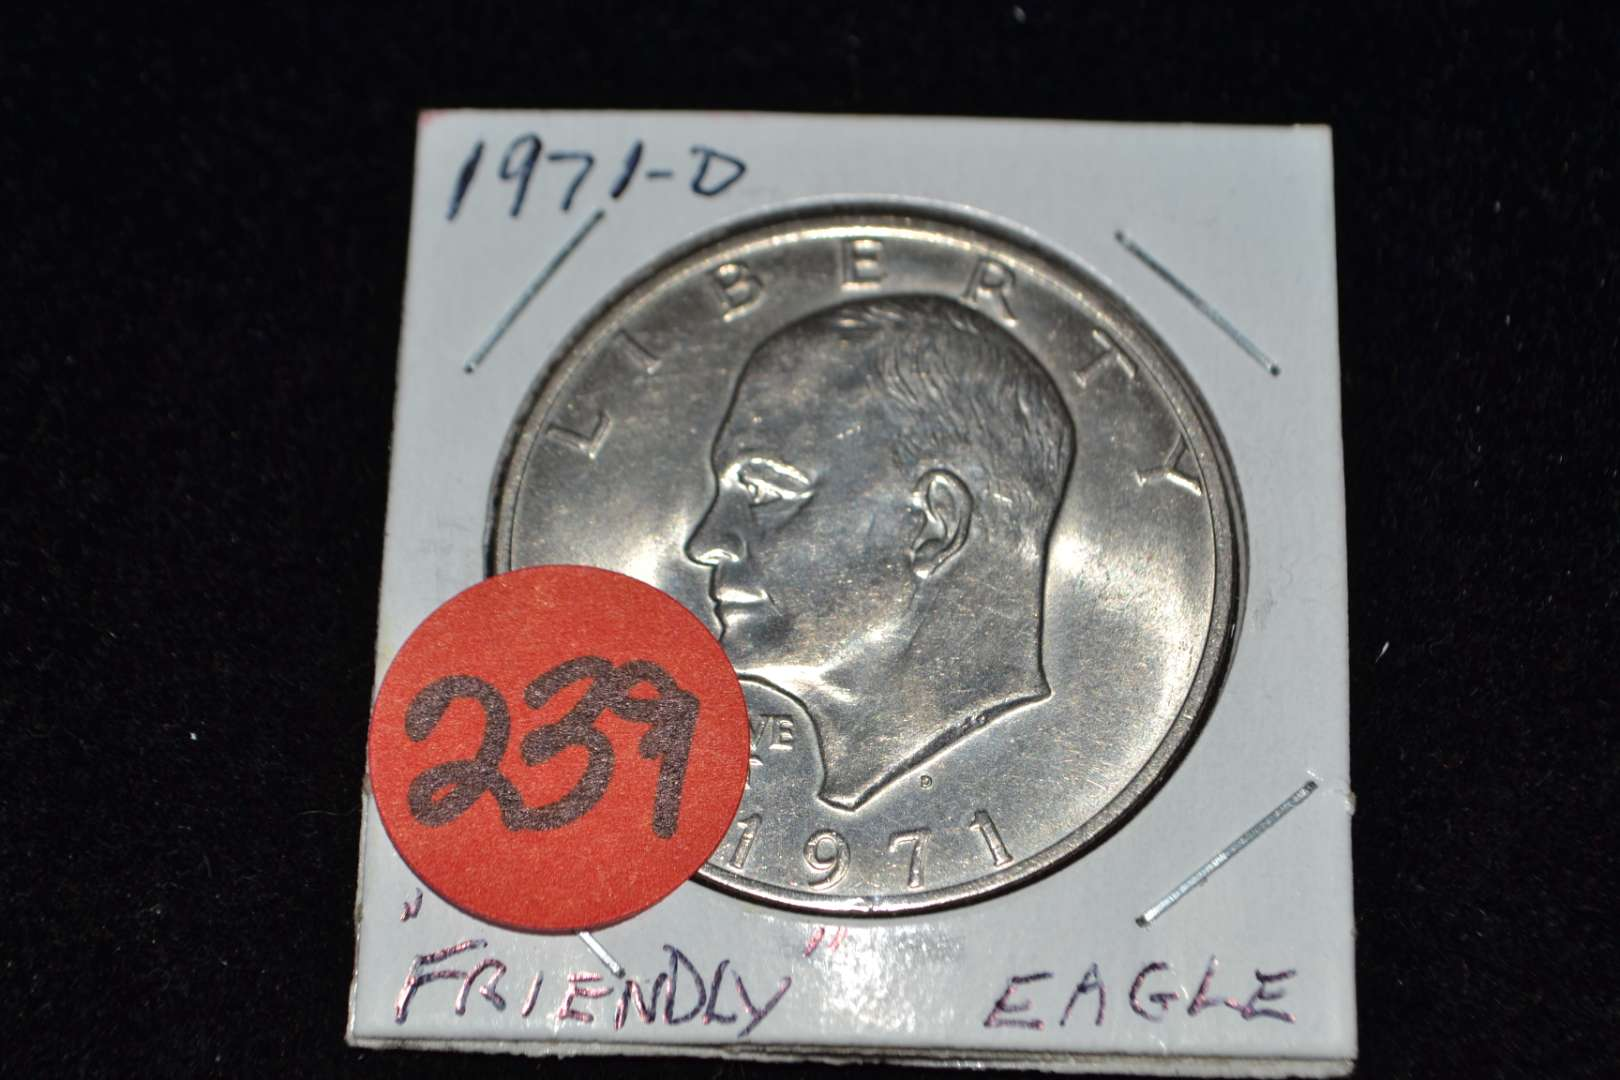 Lot # 239 1971 D EISENHOWER FRIENDLY EAGLE DOLLAR